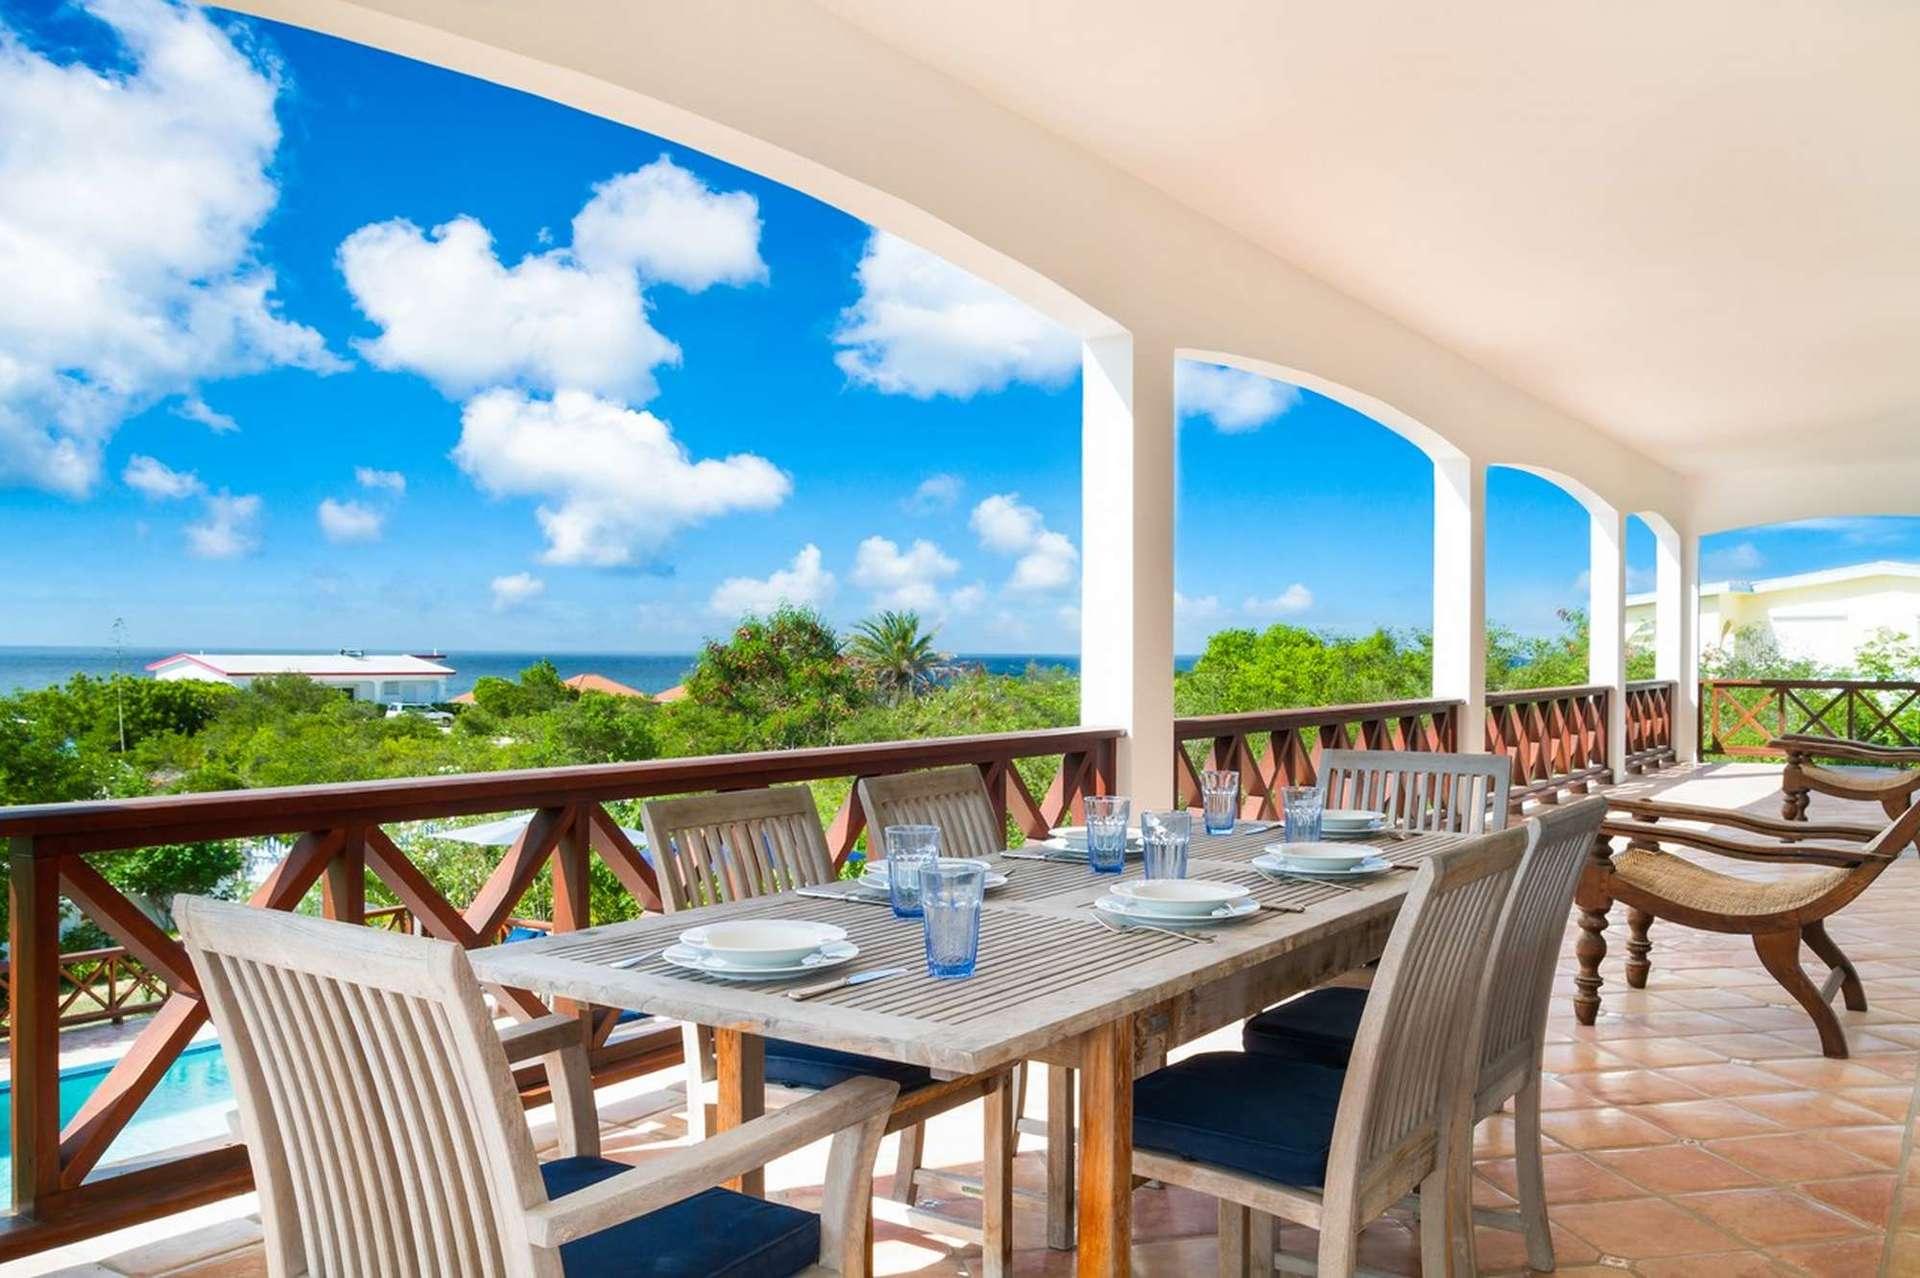 Luxury villa rentals caribbean - Anguilla - Island harbour - Tamarind - Image 1/13